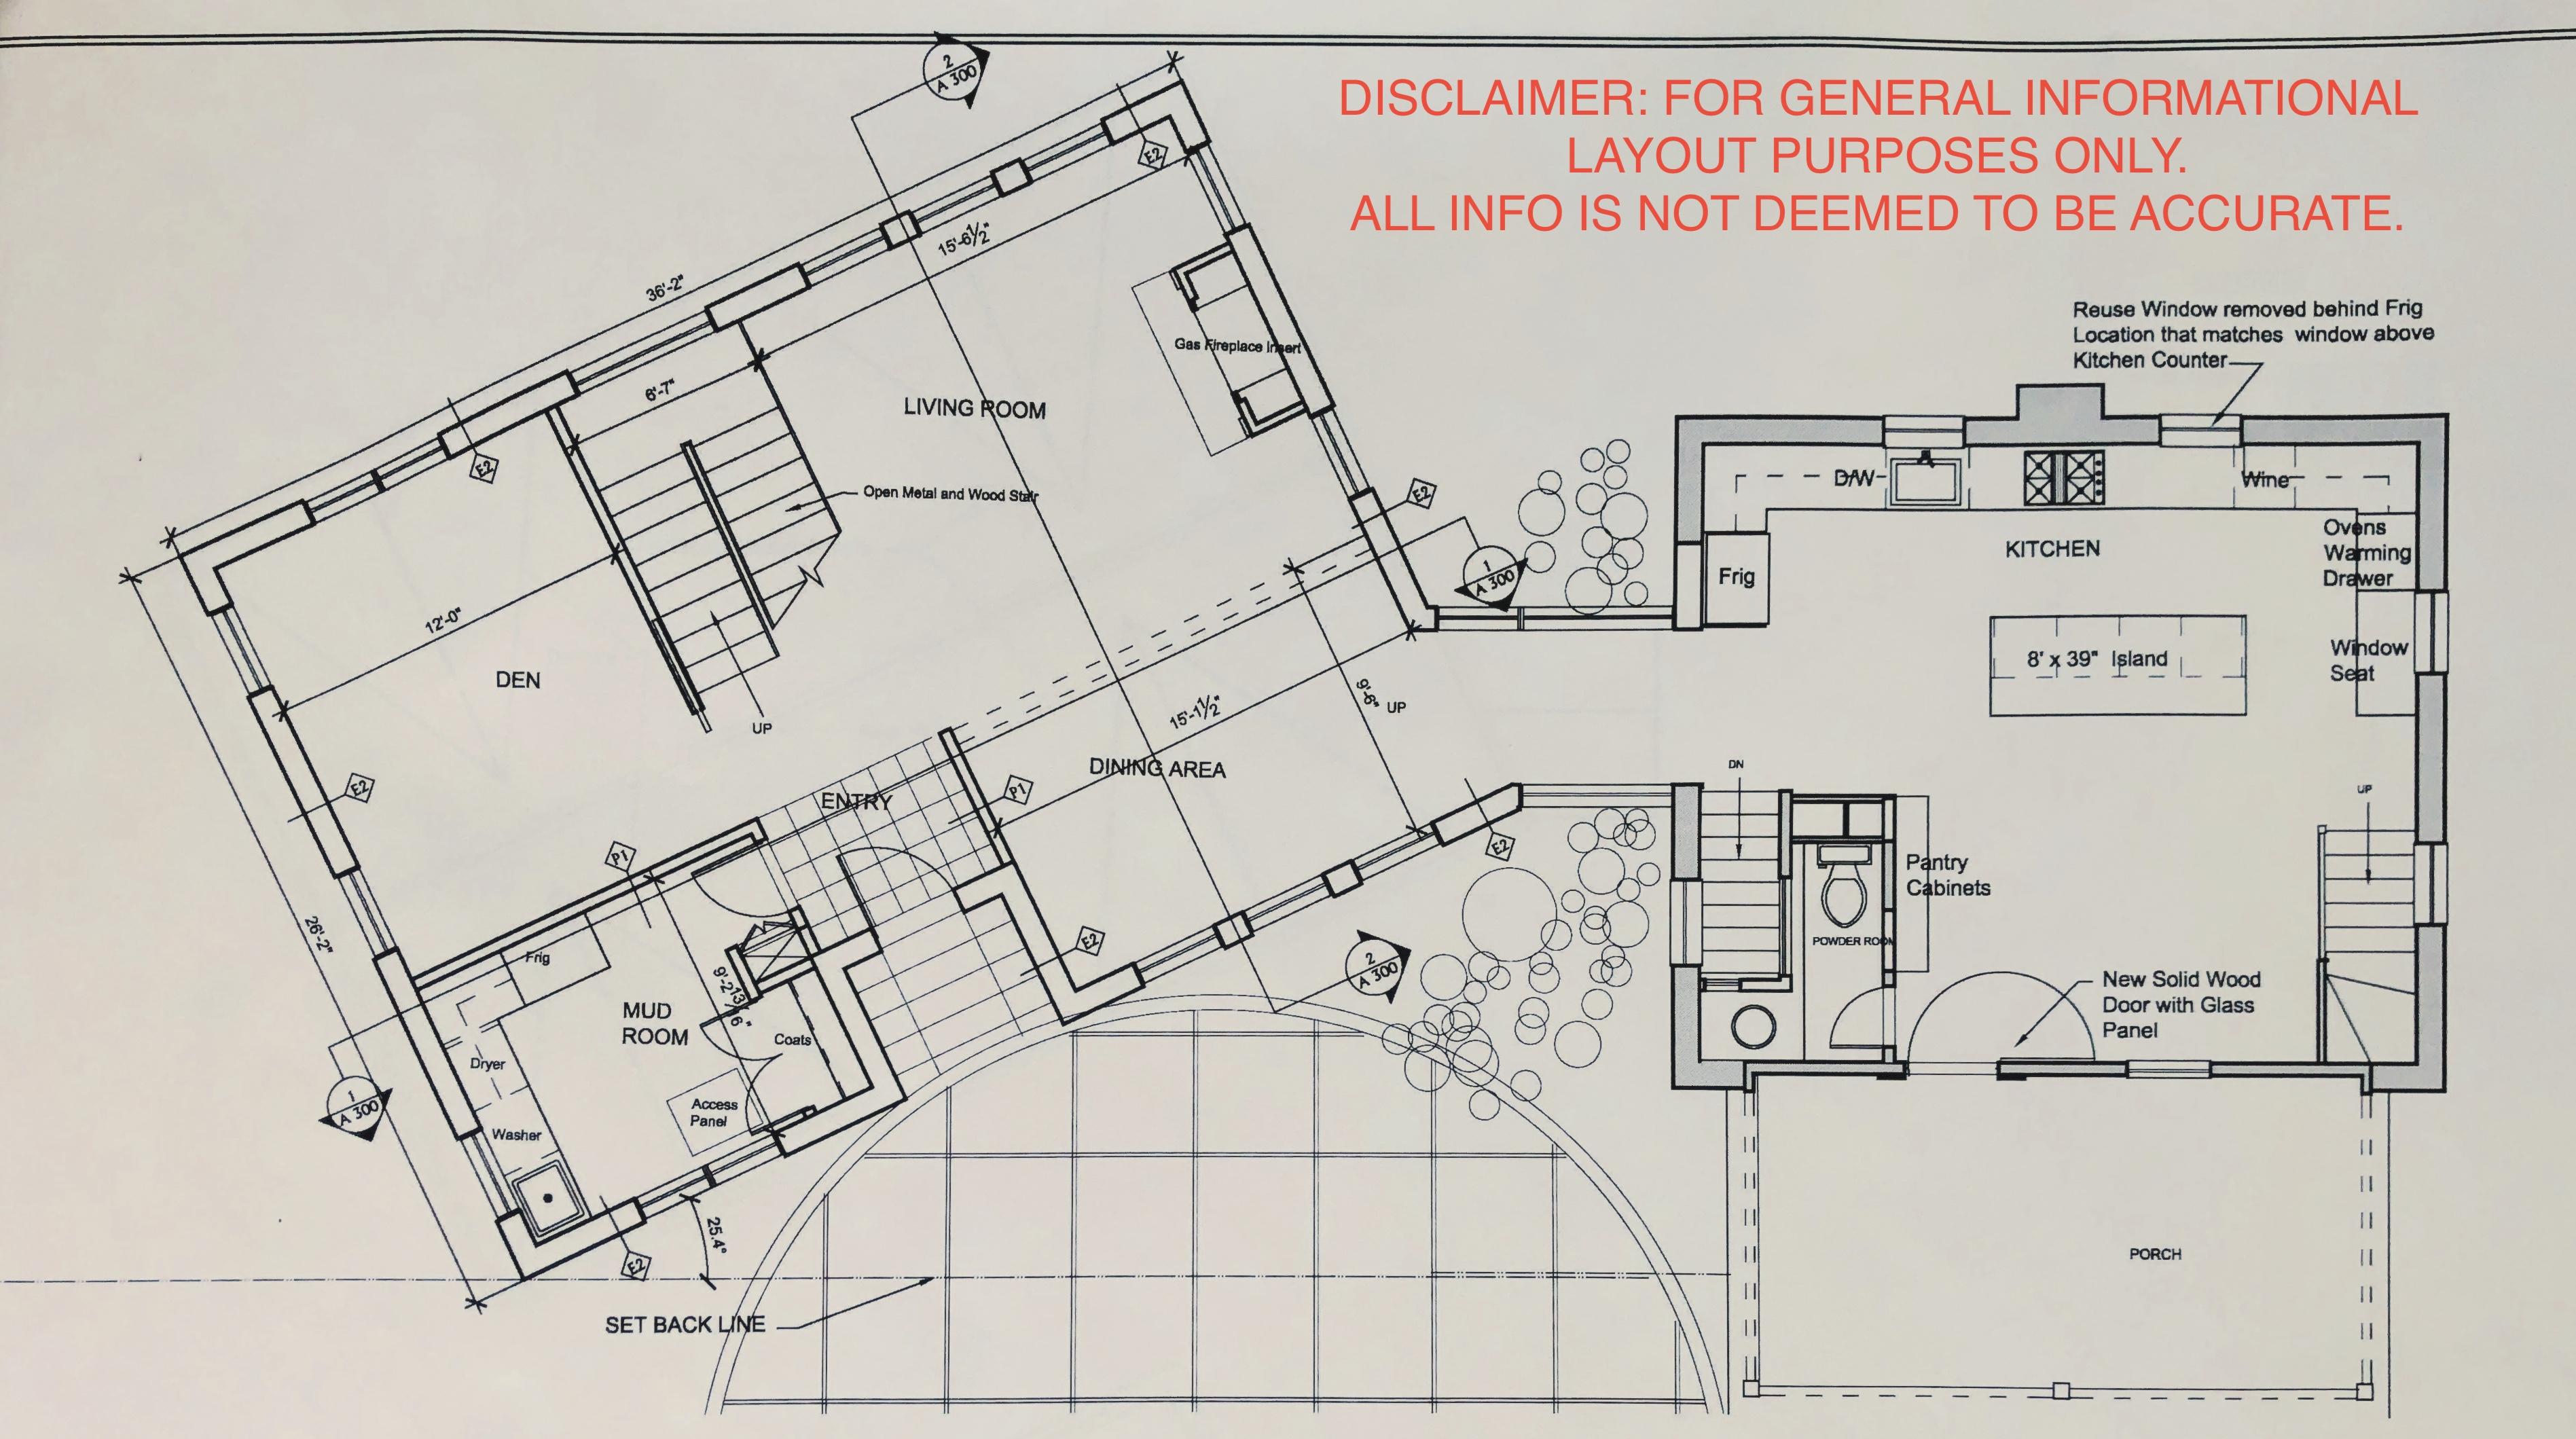 conceptual floorplan layout